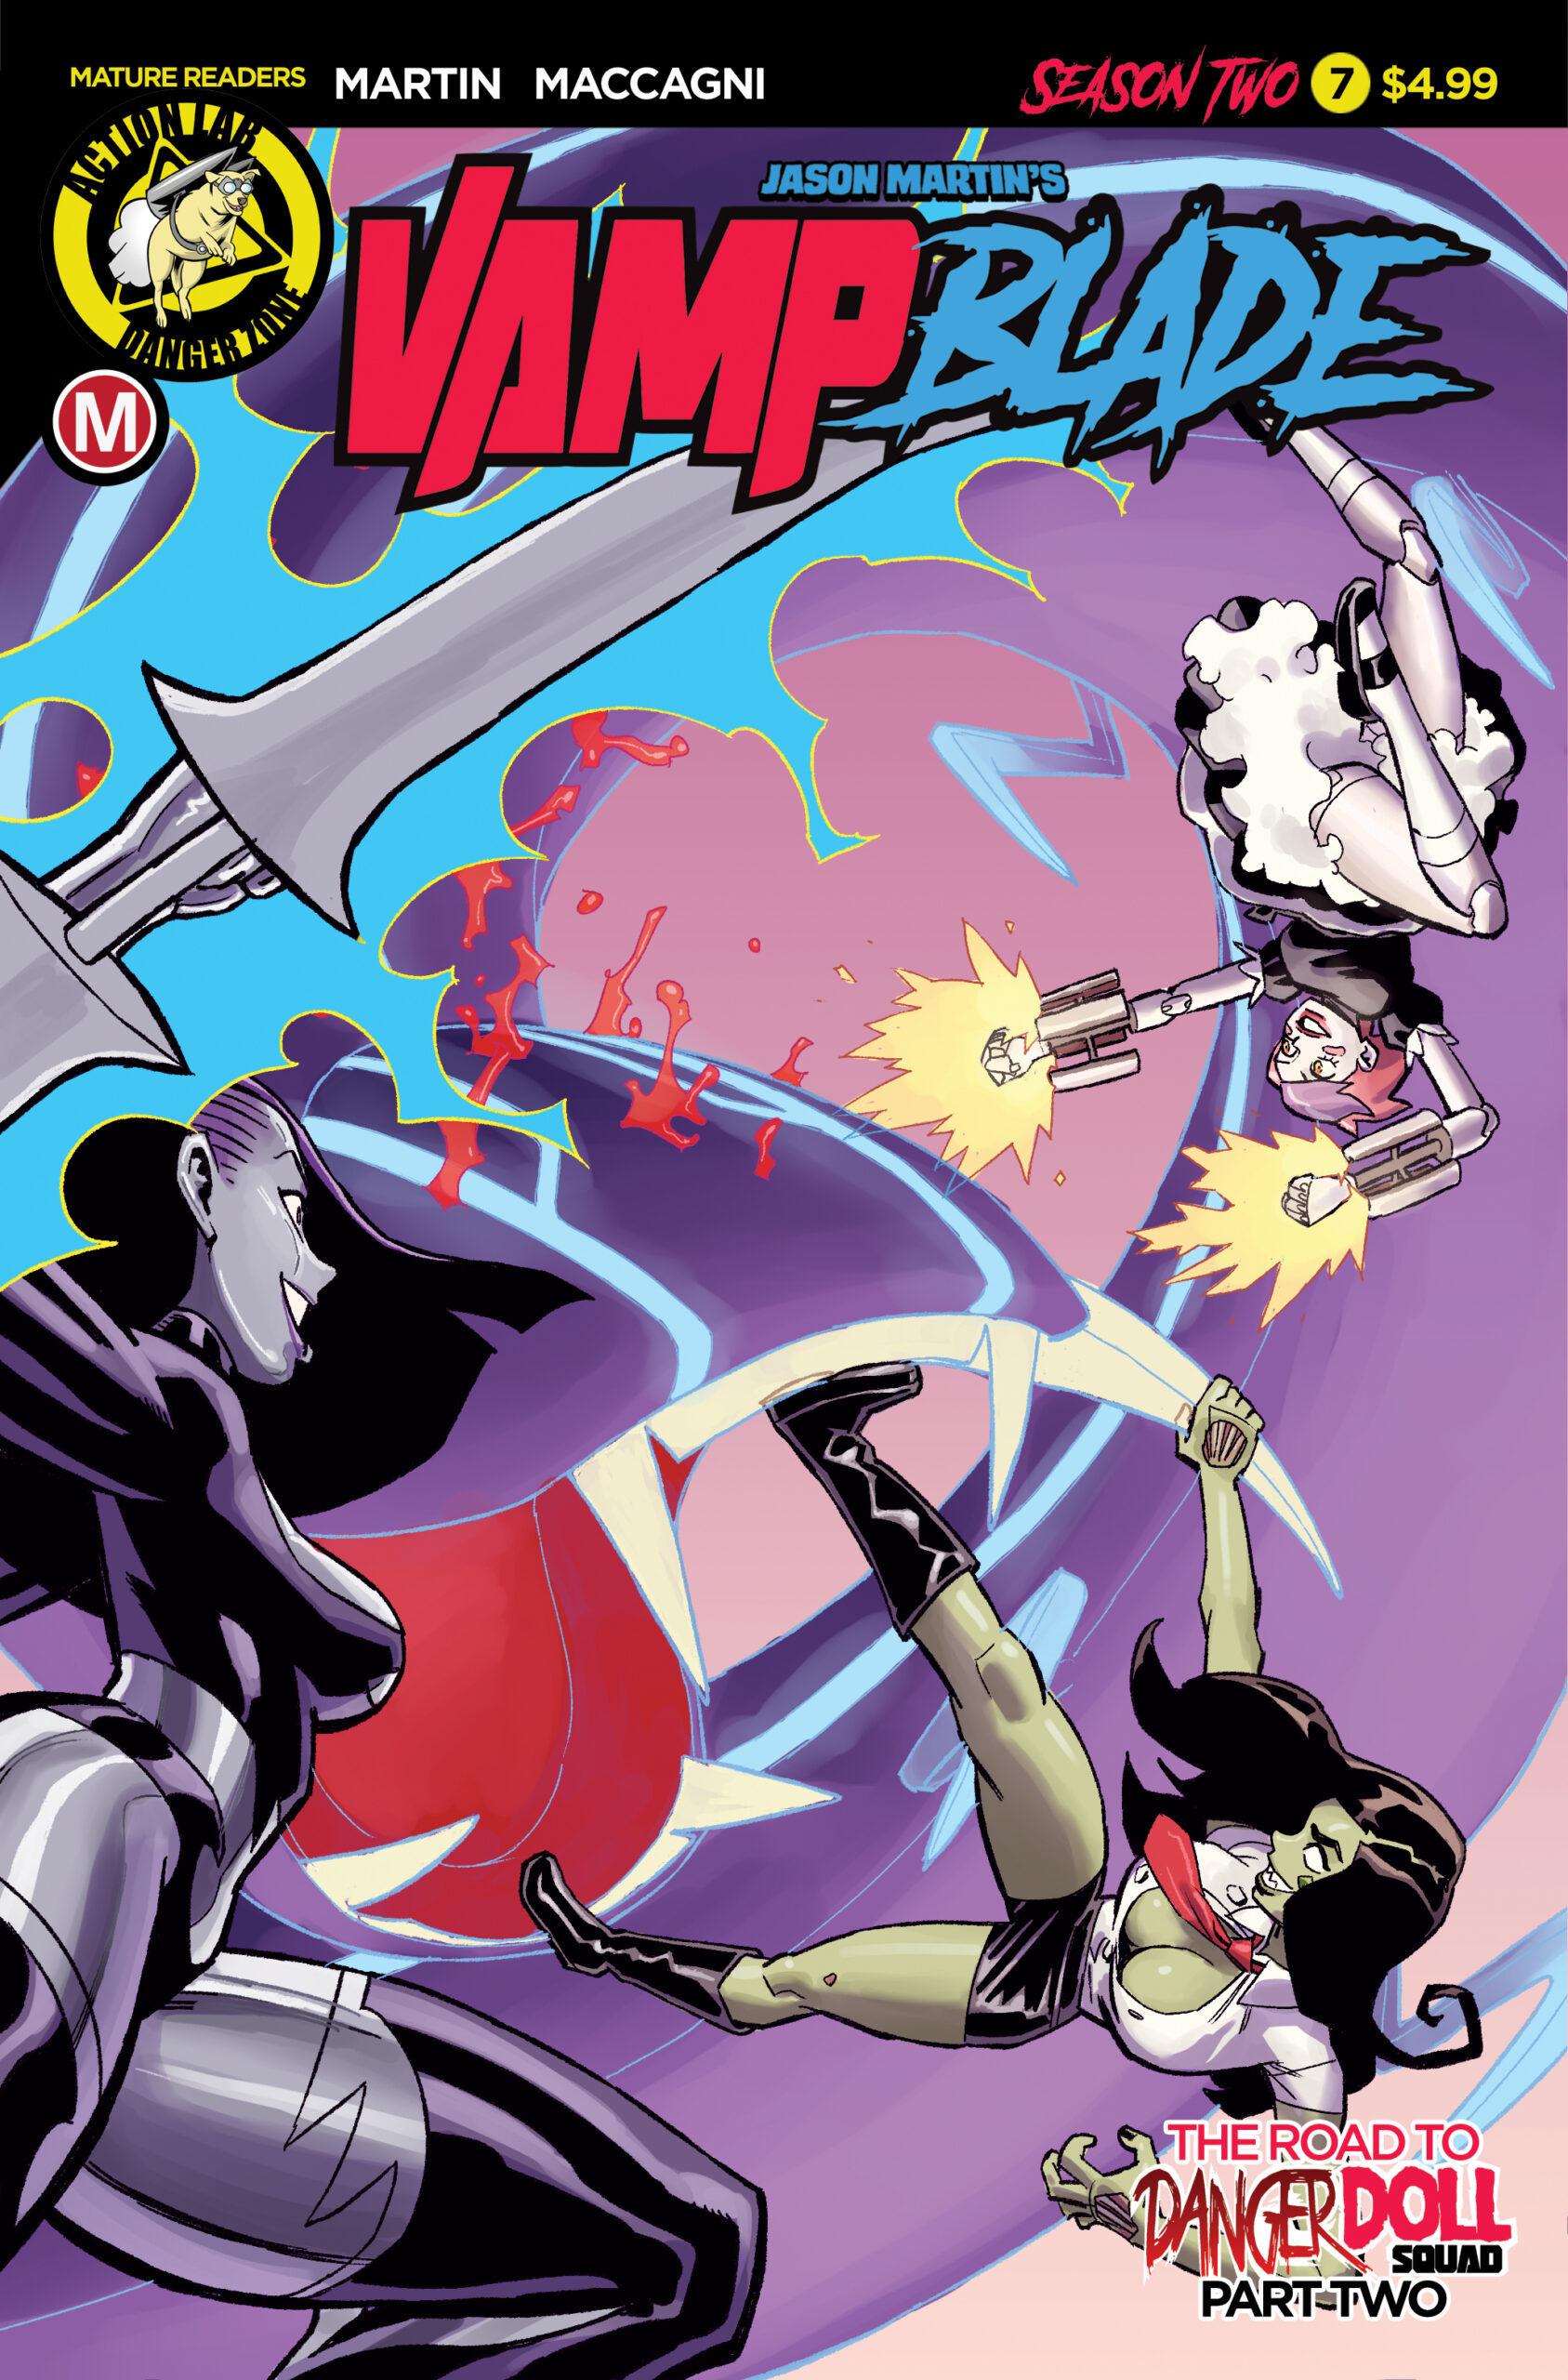 VAMPBLADE SEASON TWO #7 preview – First Comics News